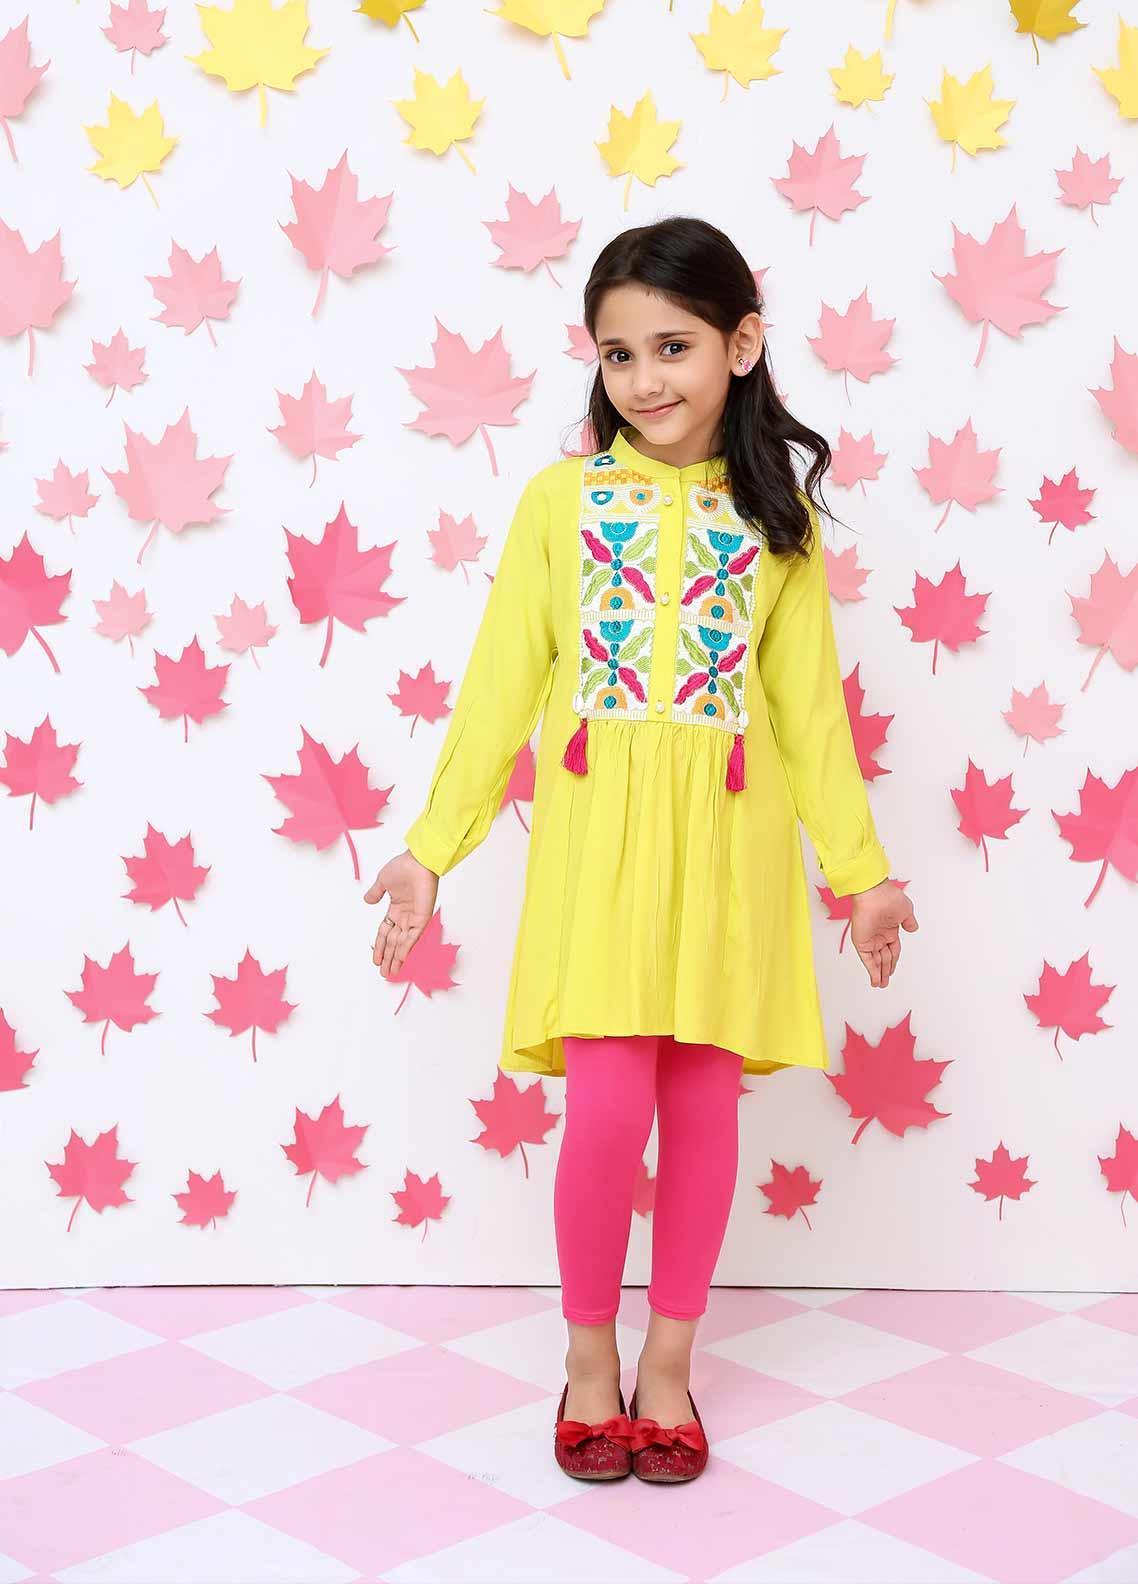 Ochre Cotton Formal Kurtis for Girls - OFK 638 Yellow